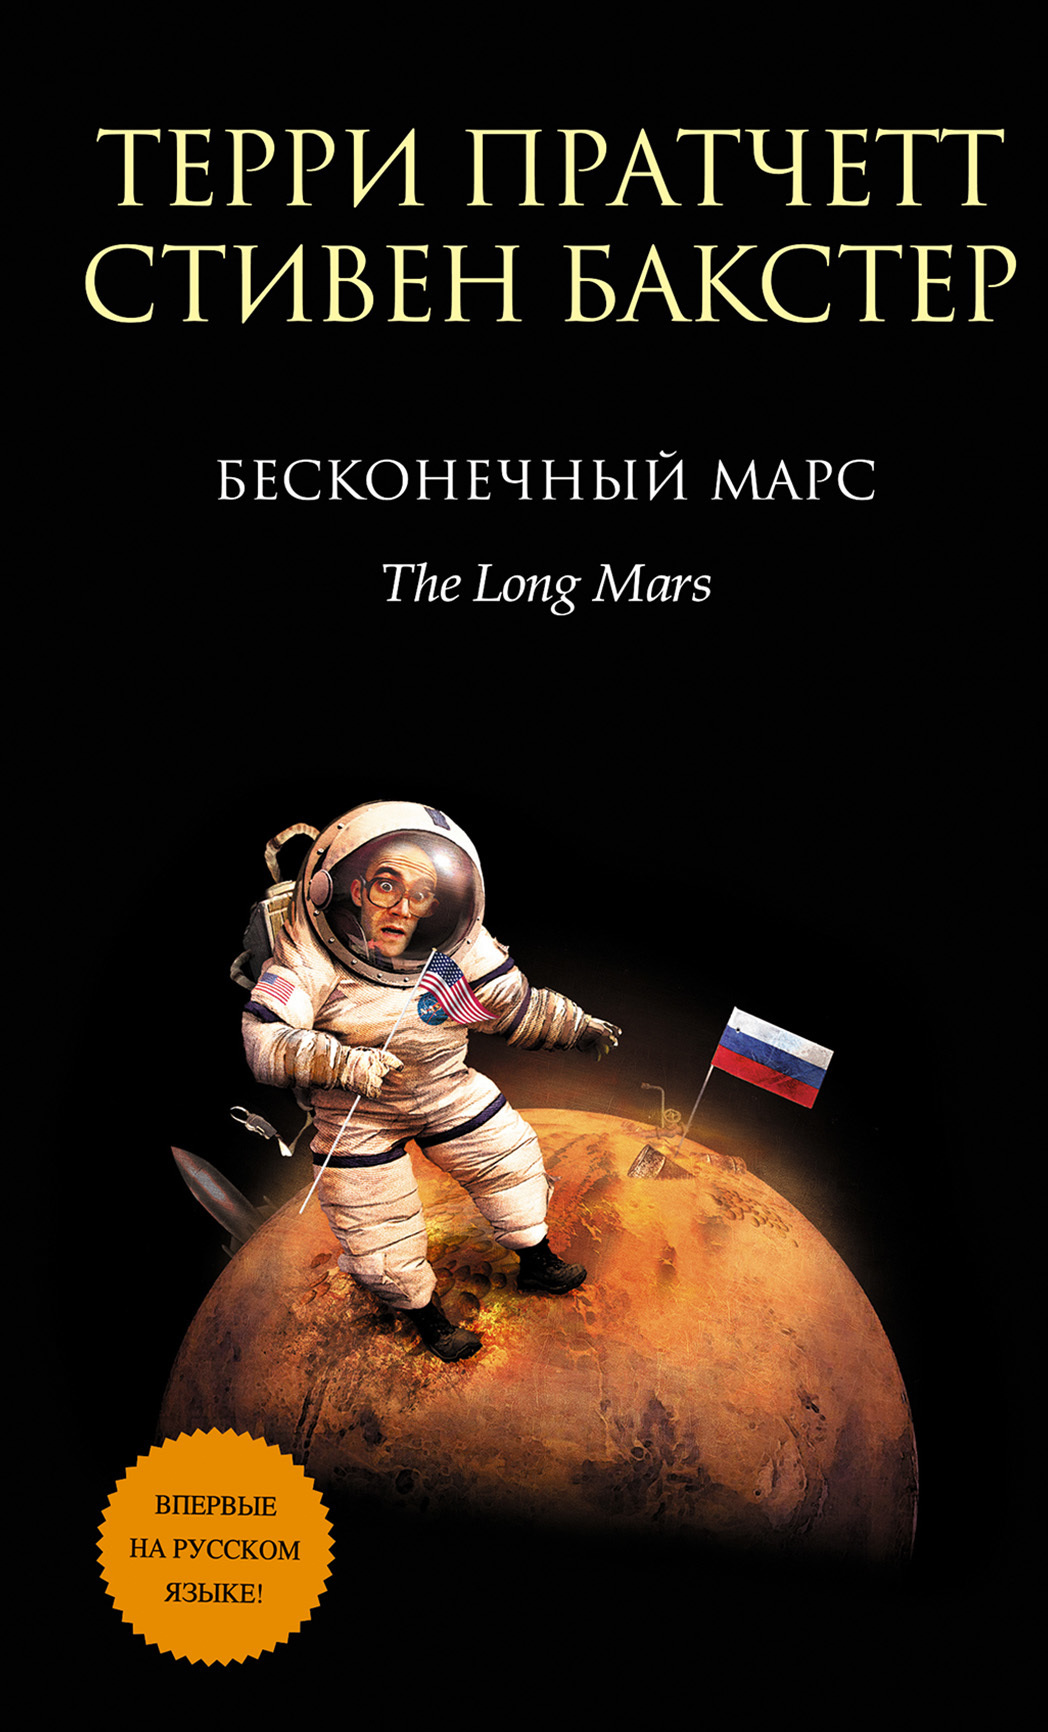 Стивен Бакстер, Терри Пратчетт - Бесконечный Марс